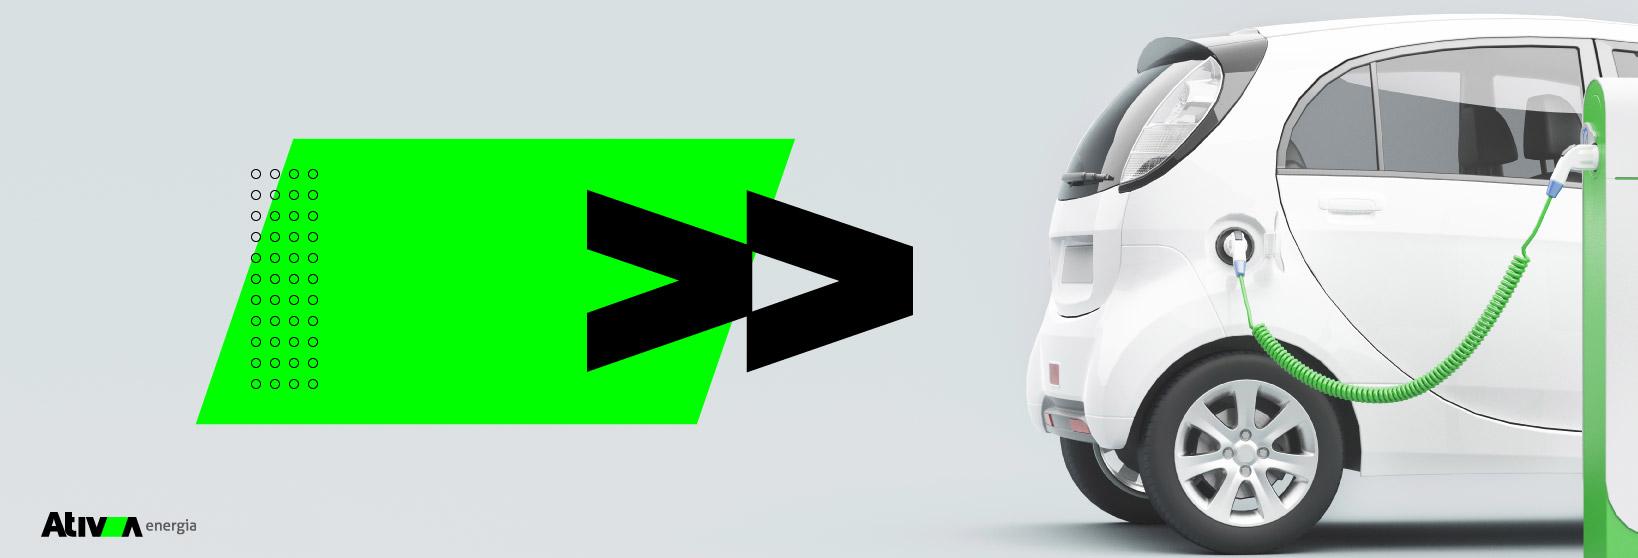 Mobilidade Elétrica Ativa Energia